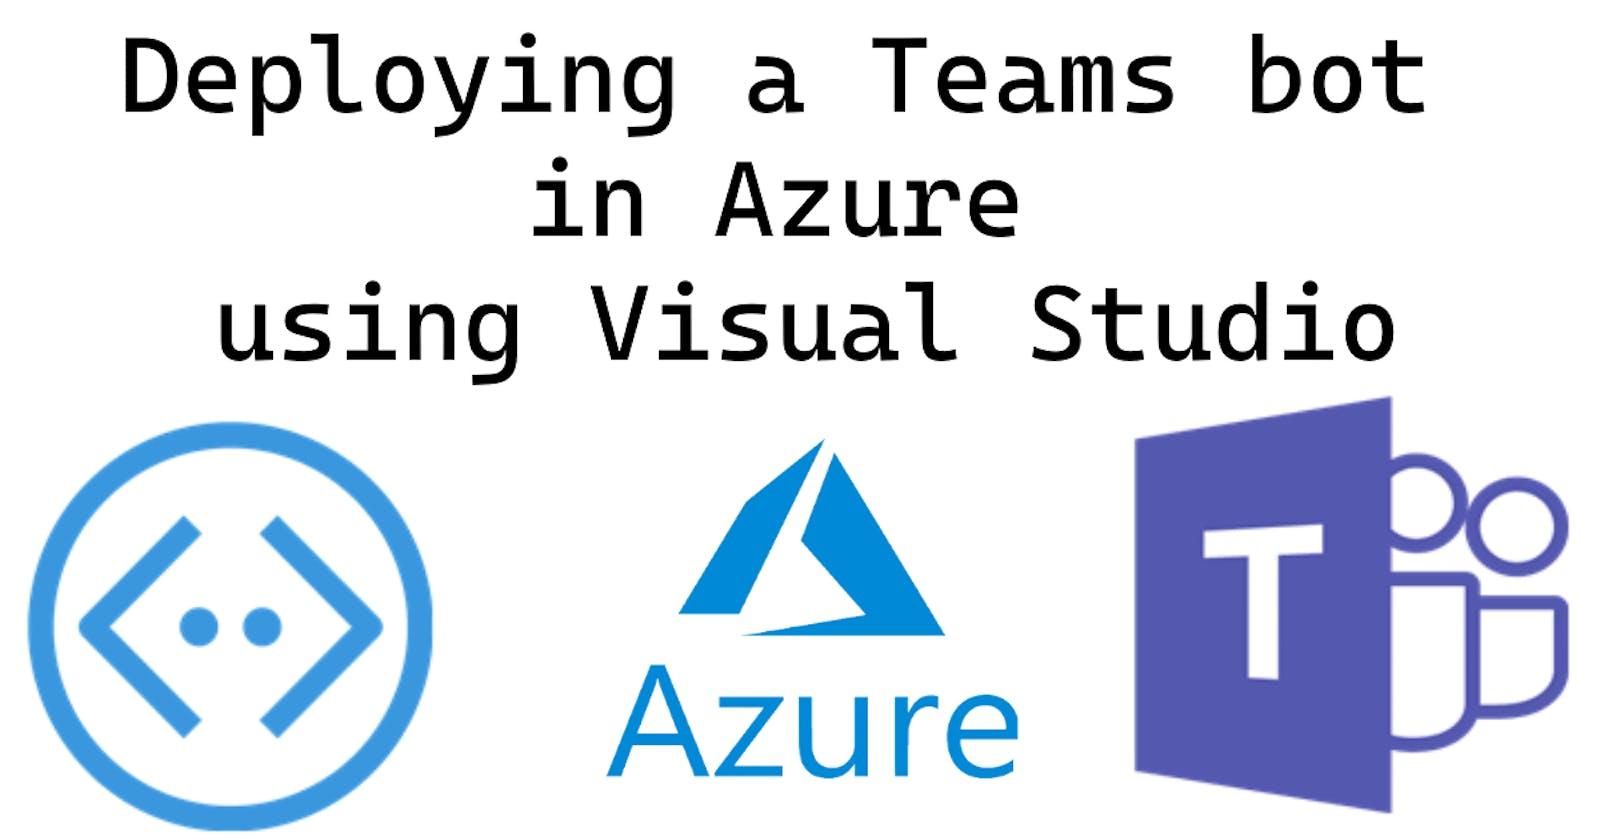 Deploying a Teams bot in Azure using Visual Studio